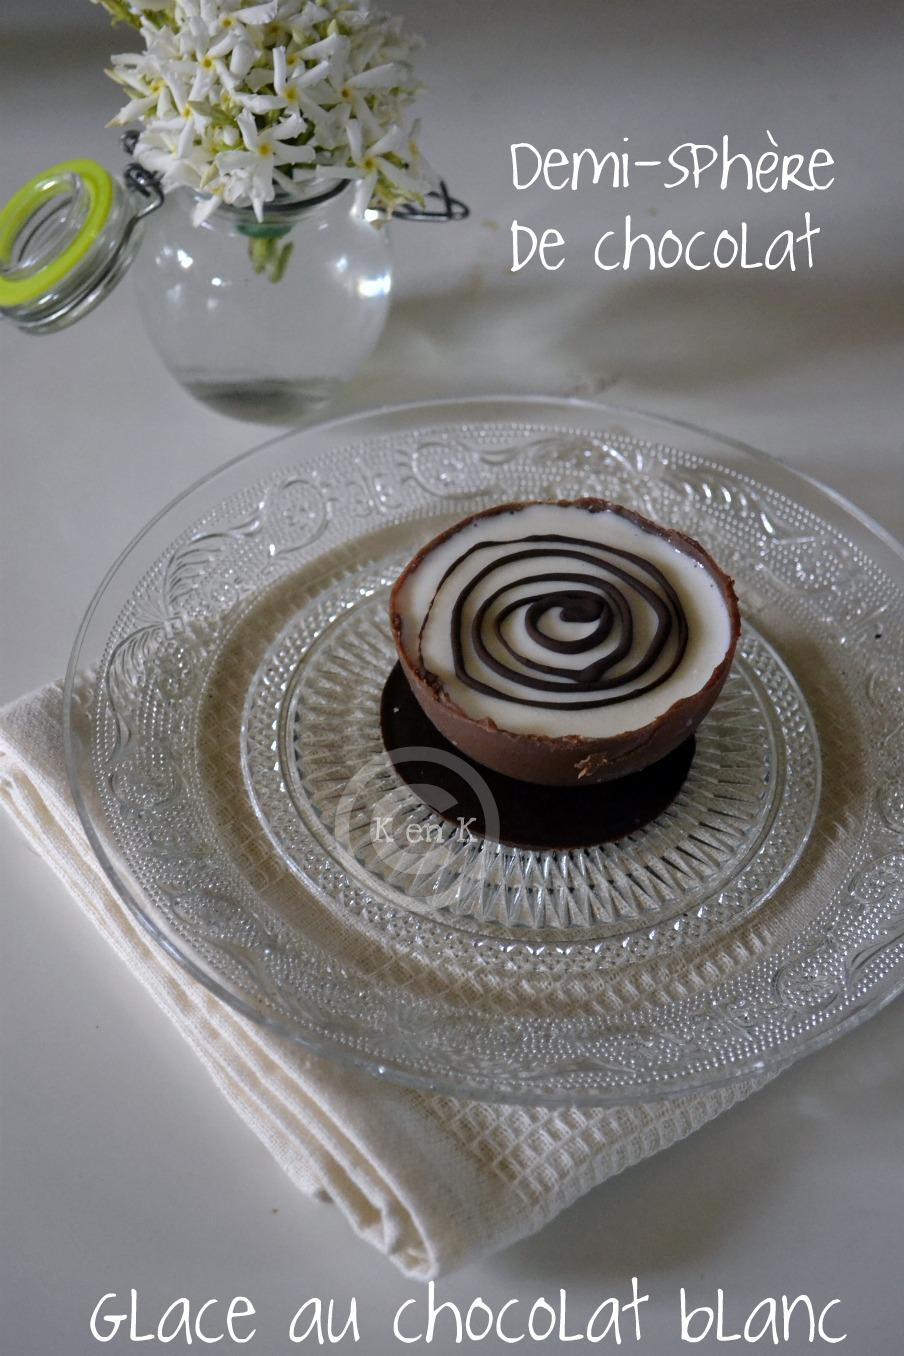 Demi Sphere Chocolat A La Glace Au Chocolat Blanc